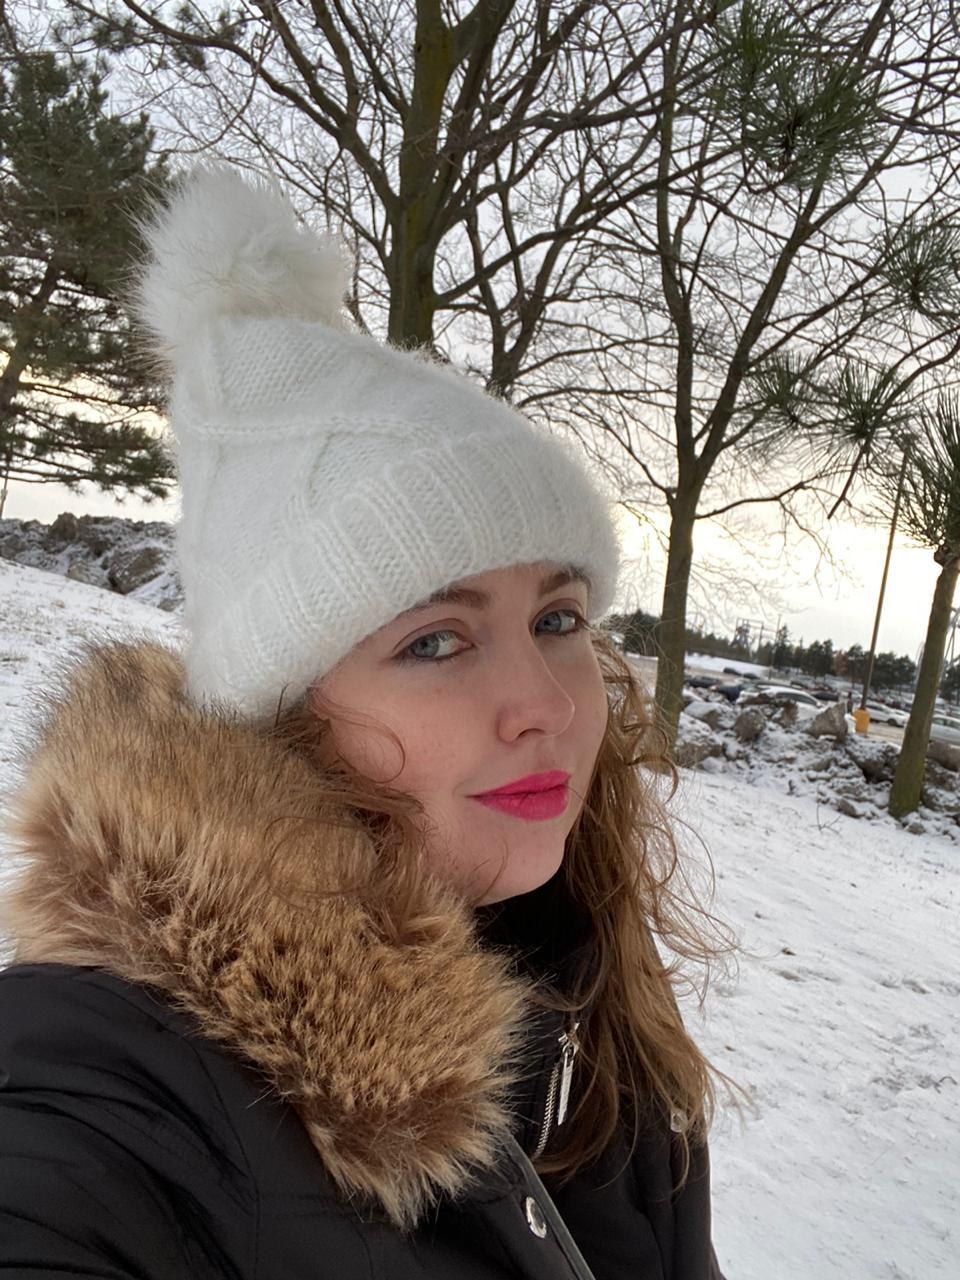 Júlia fez intercâmbio durante o inverno no Canadá